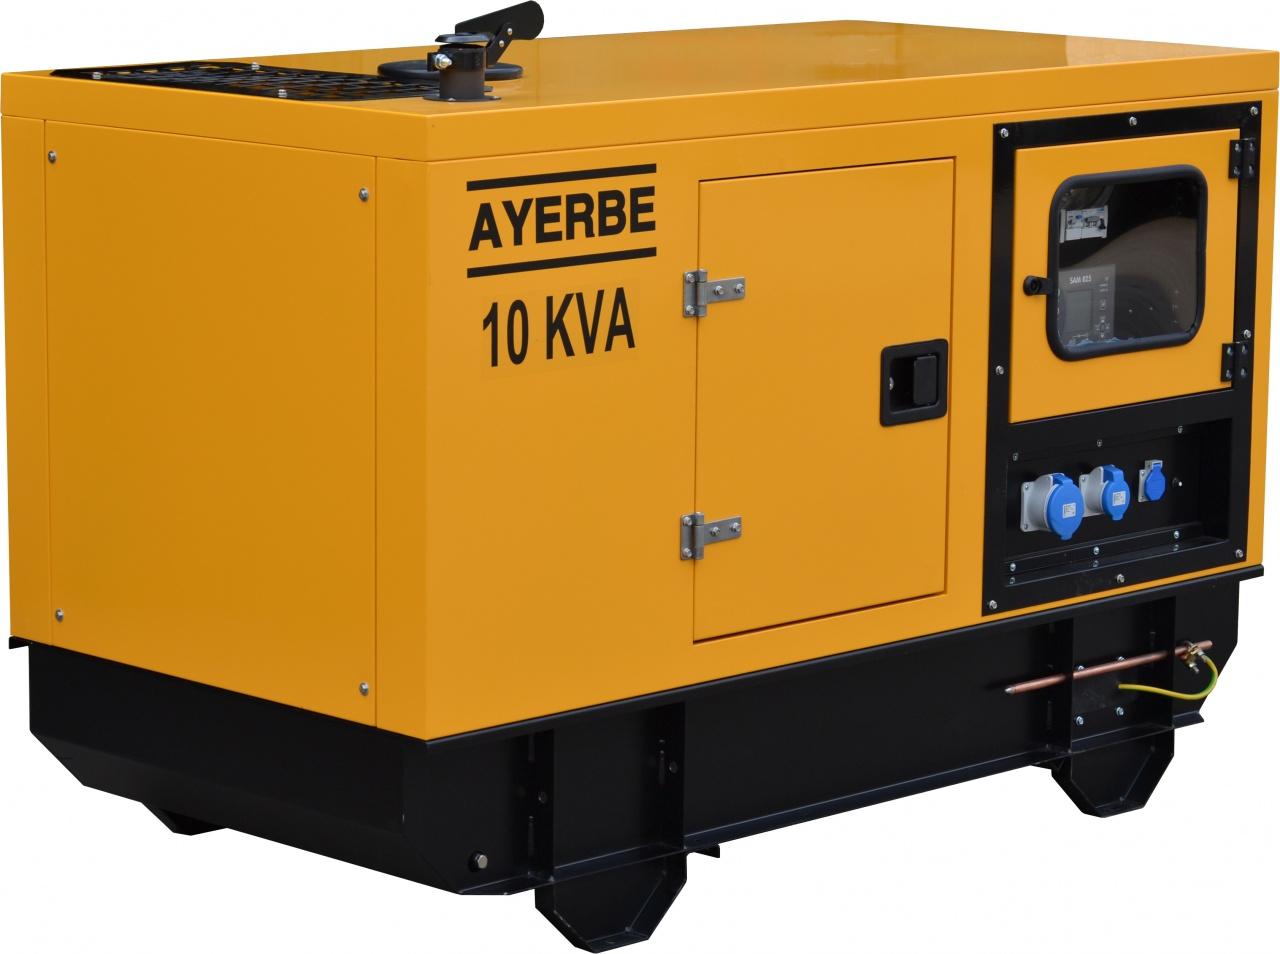 дизельная электростанция ayerbe ay11ls